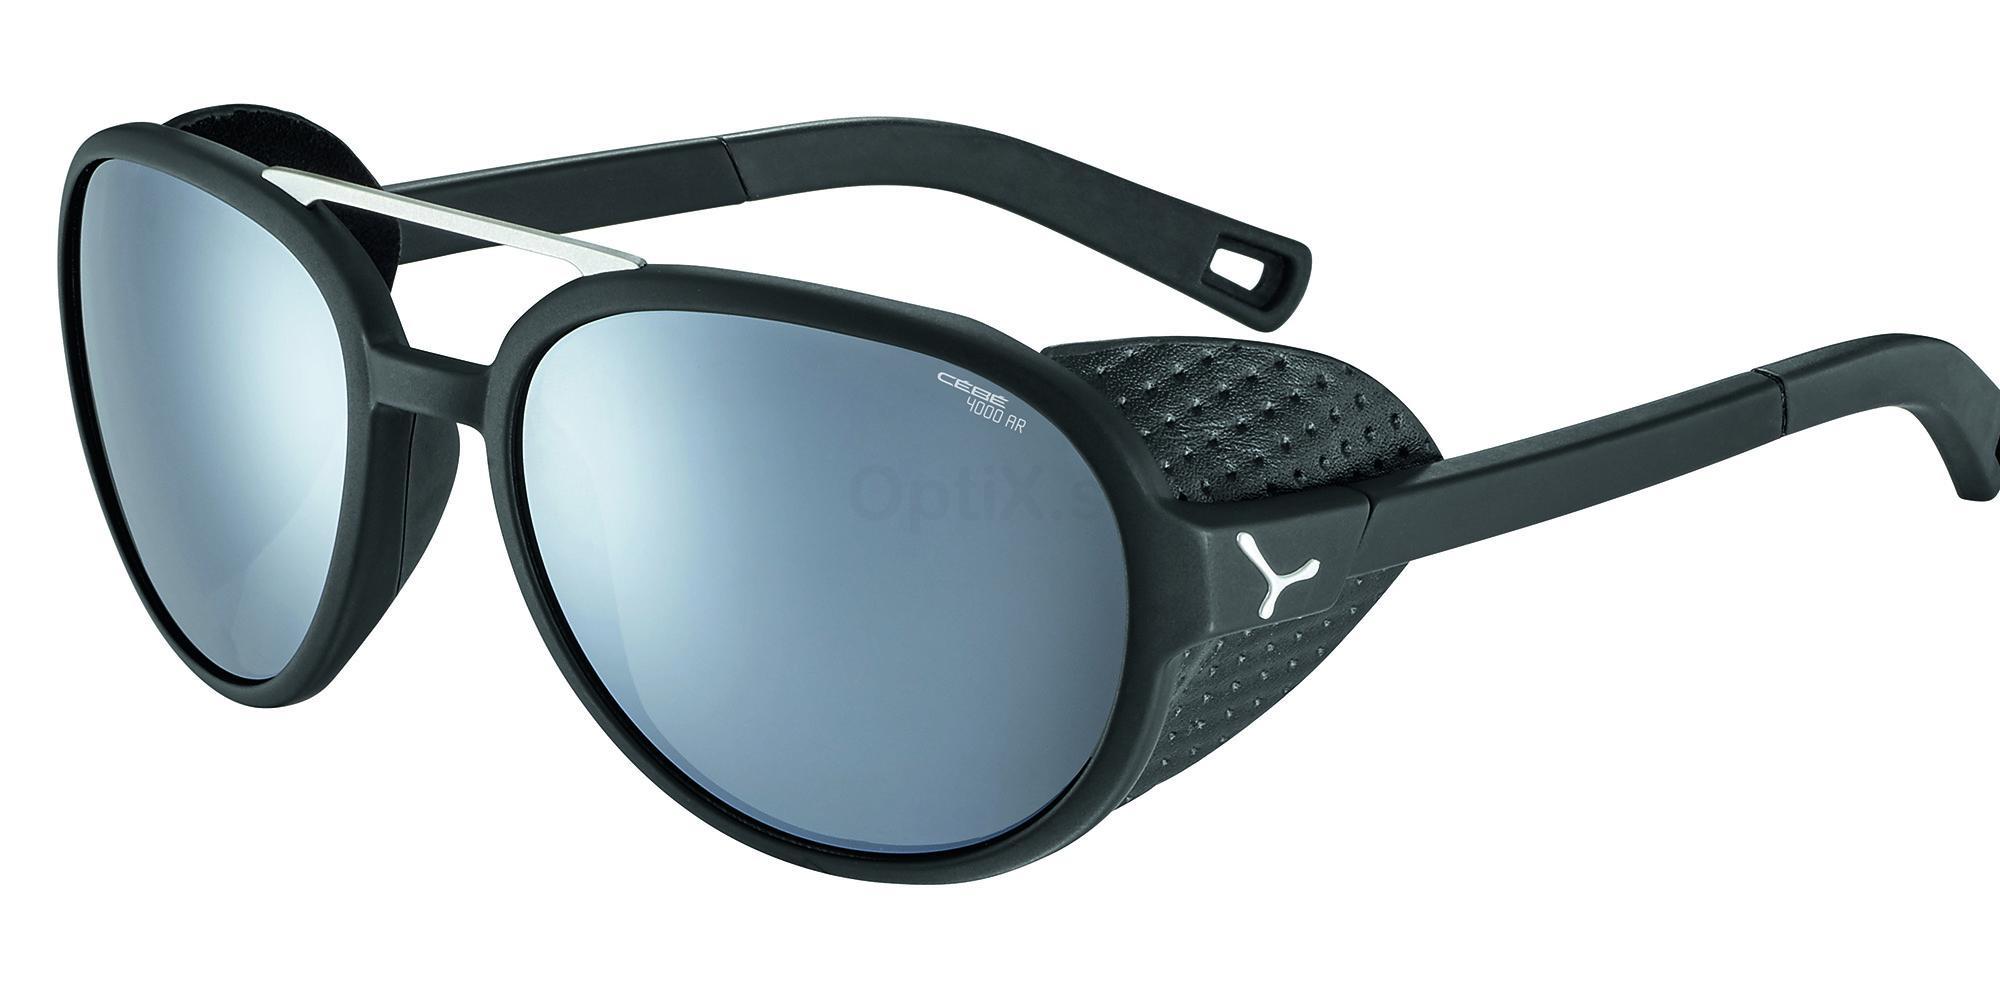 CBSUM1 SUMMIT Sunglasses, Cebe